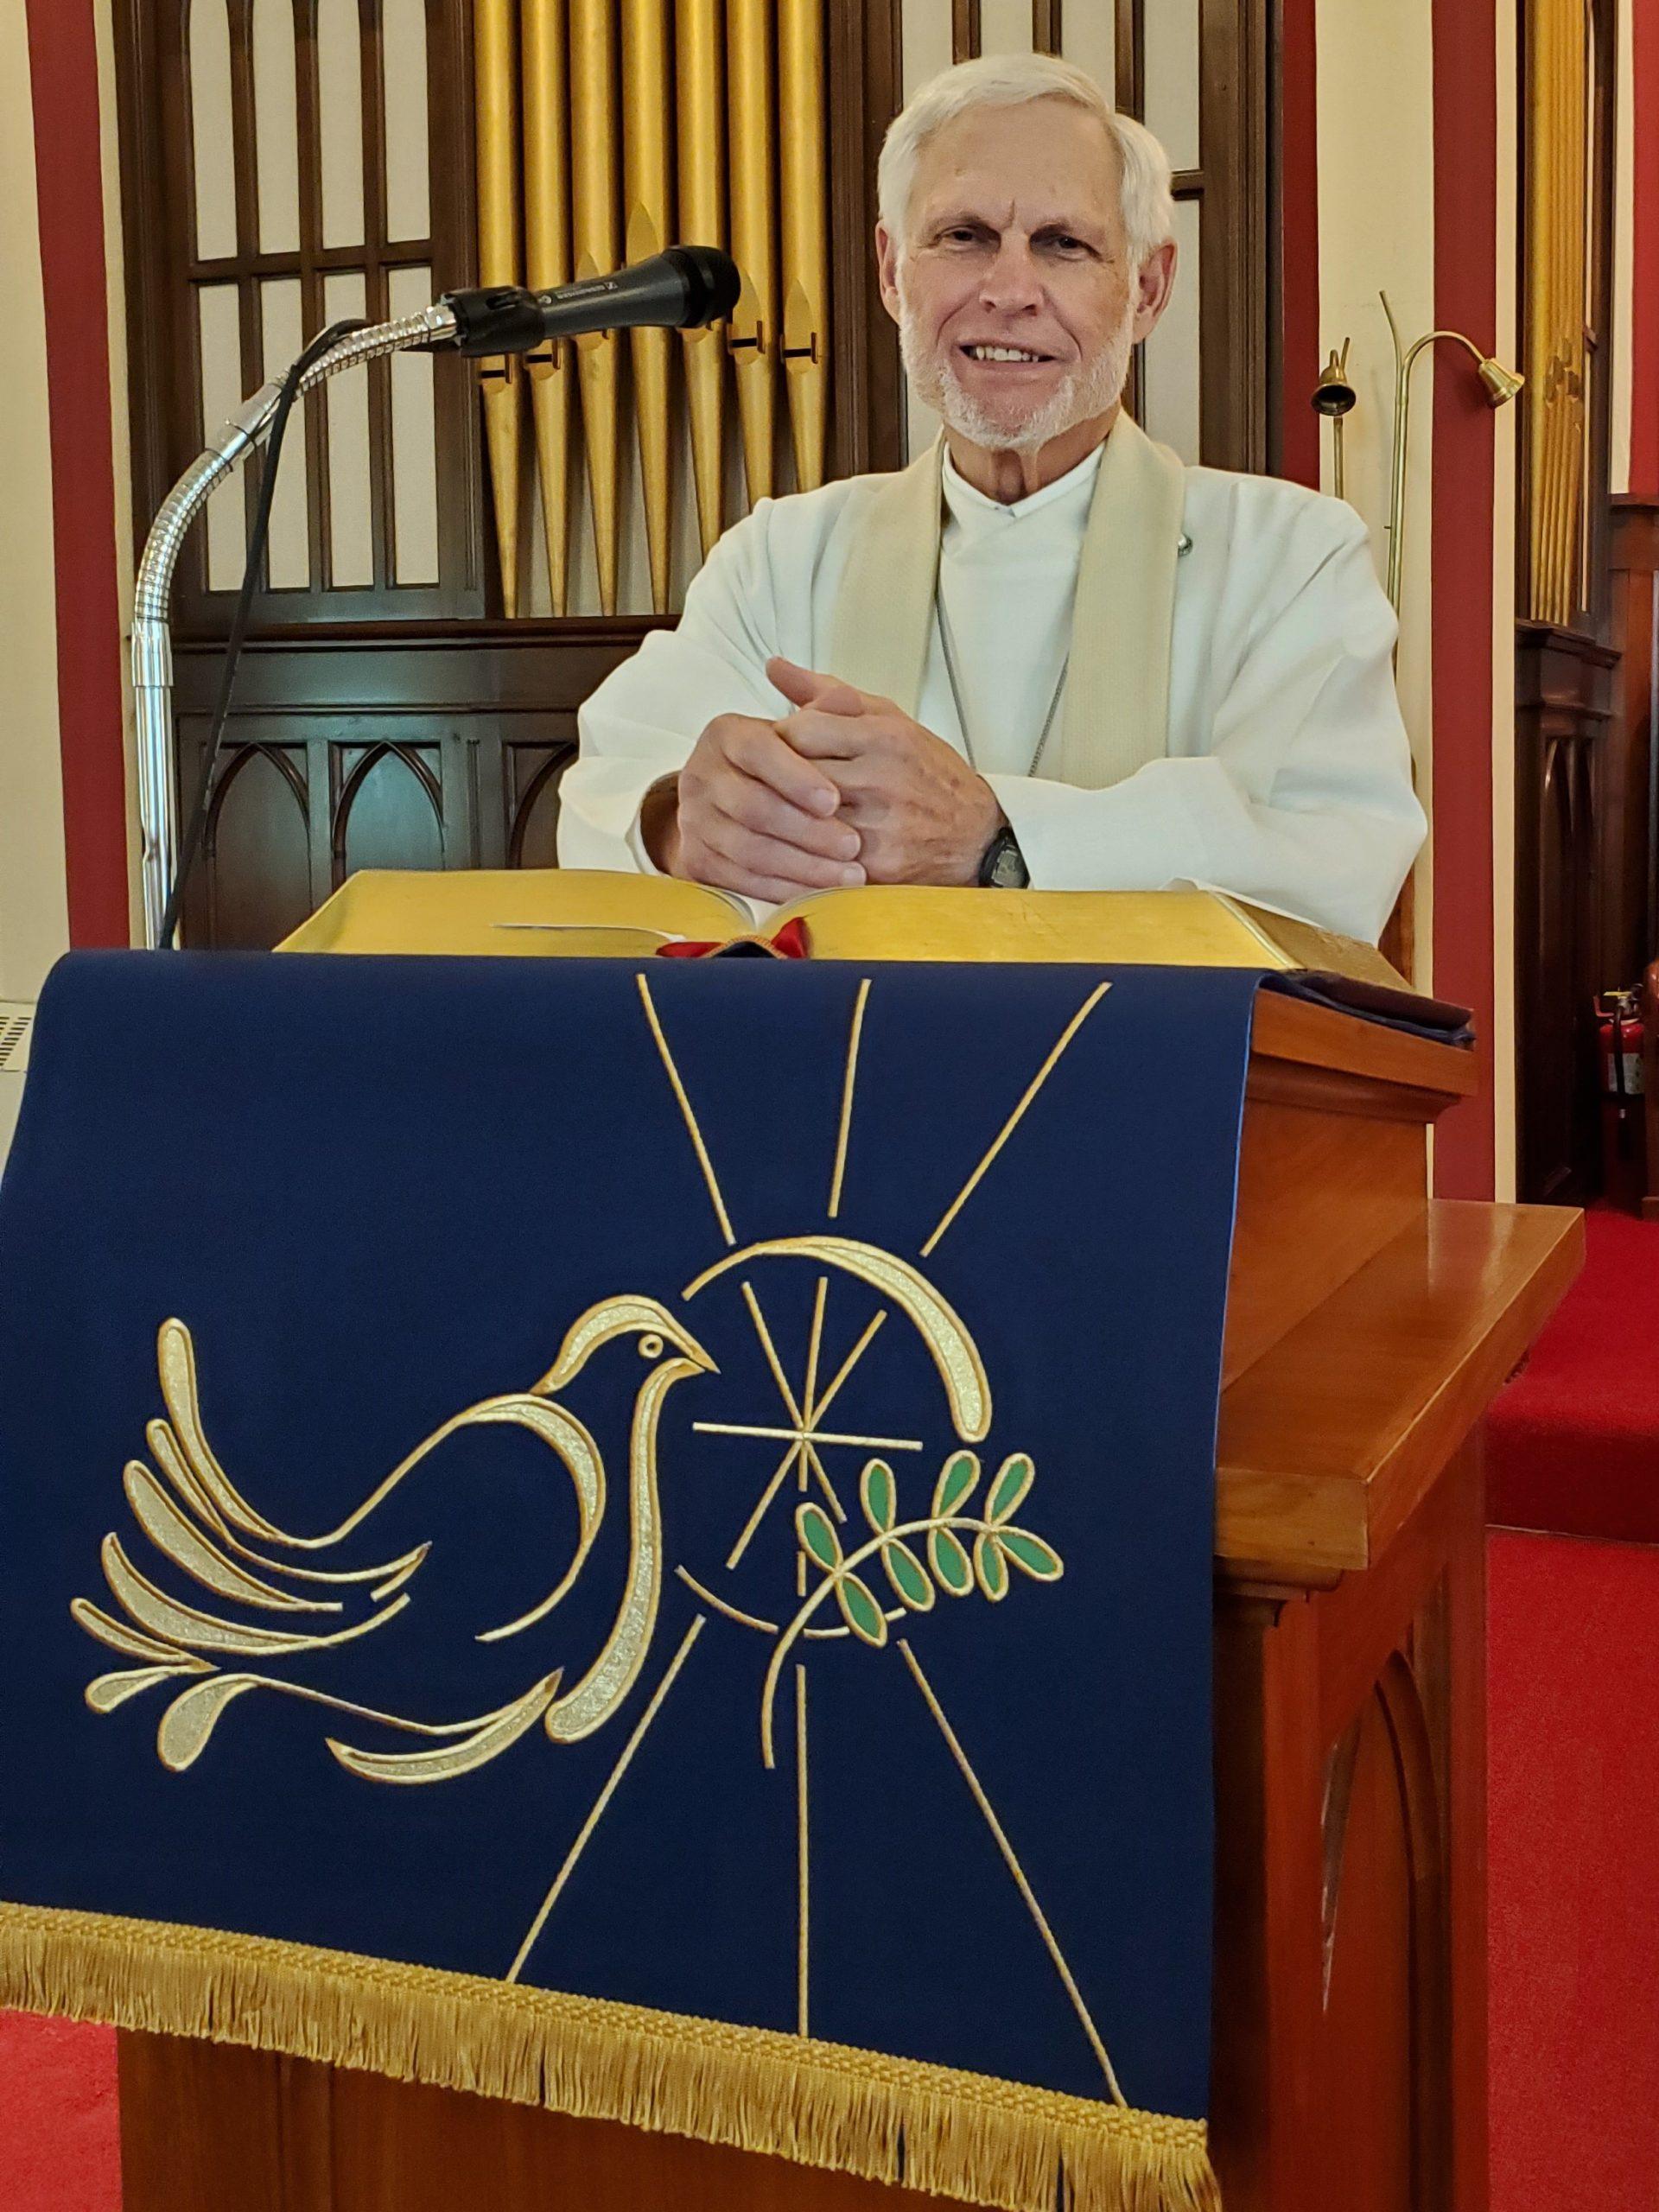 Pastor Dave Clark